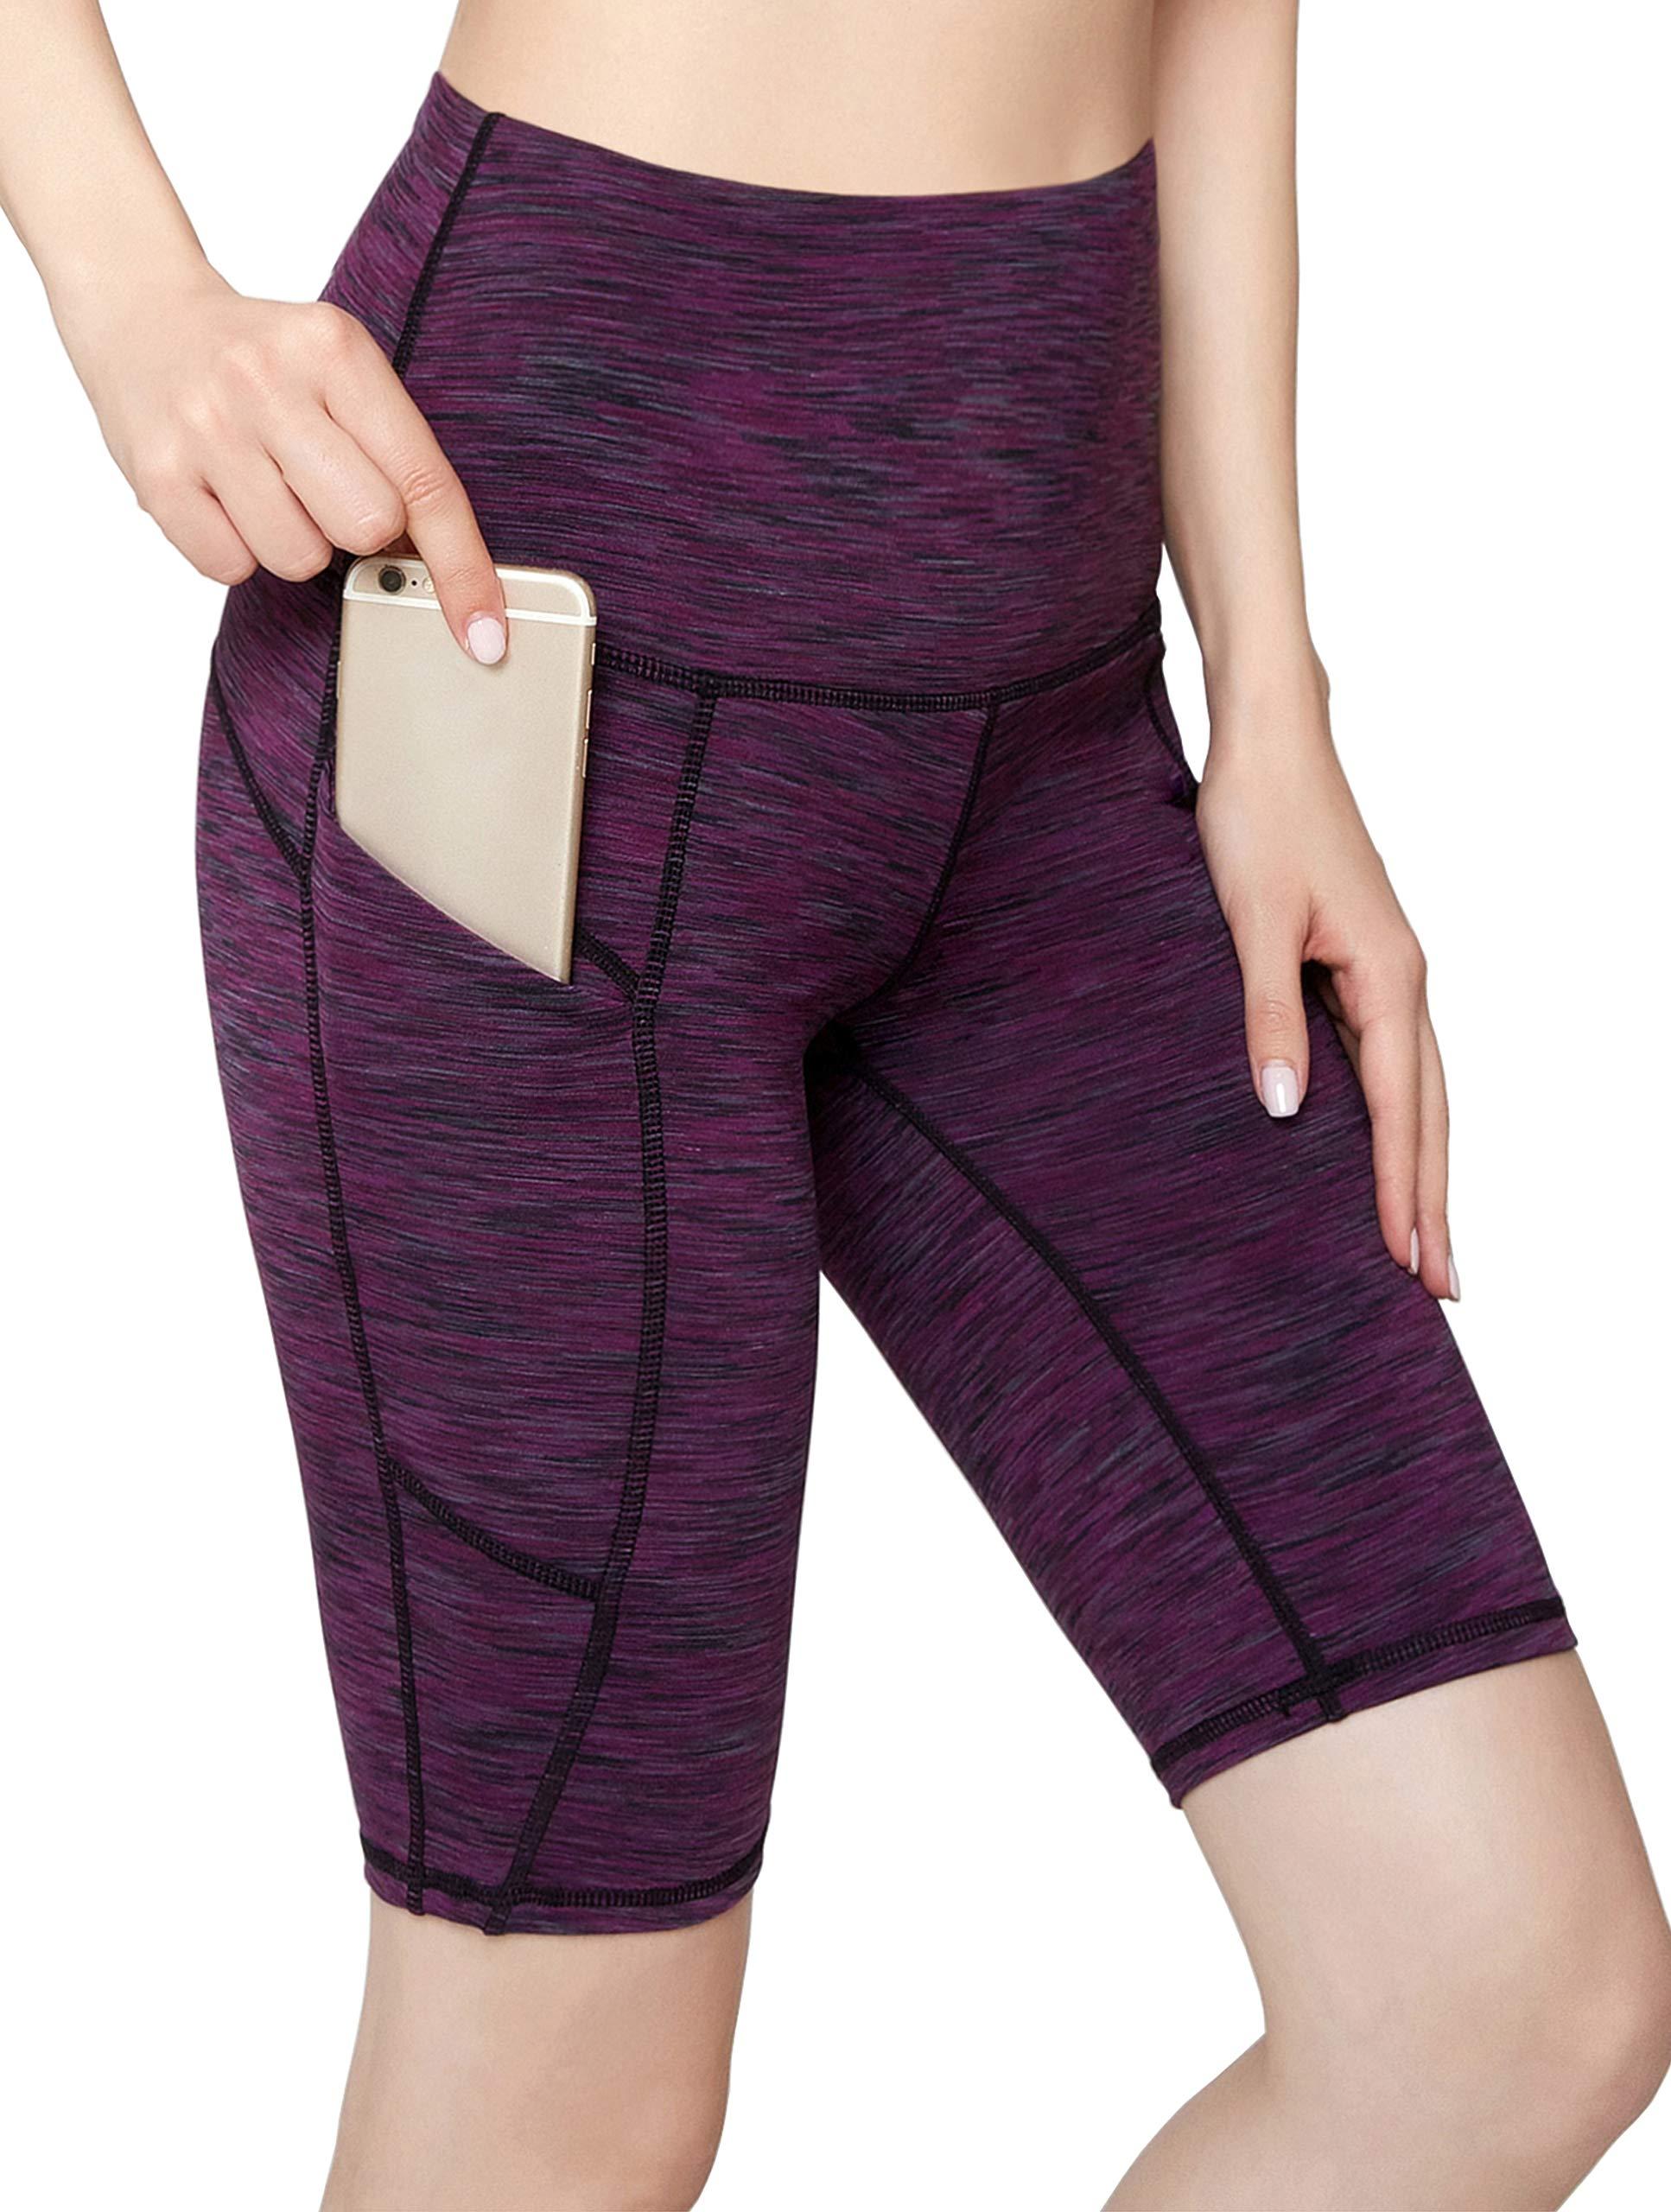 Oalka Women's Short Yoga Side Pockets High Waist Workout Running Shorts Space Dye Camo Purple XXL by Oalka